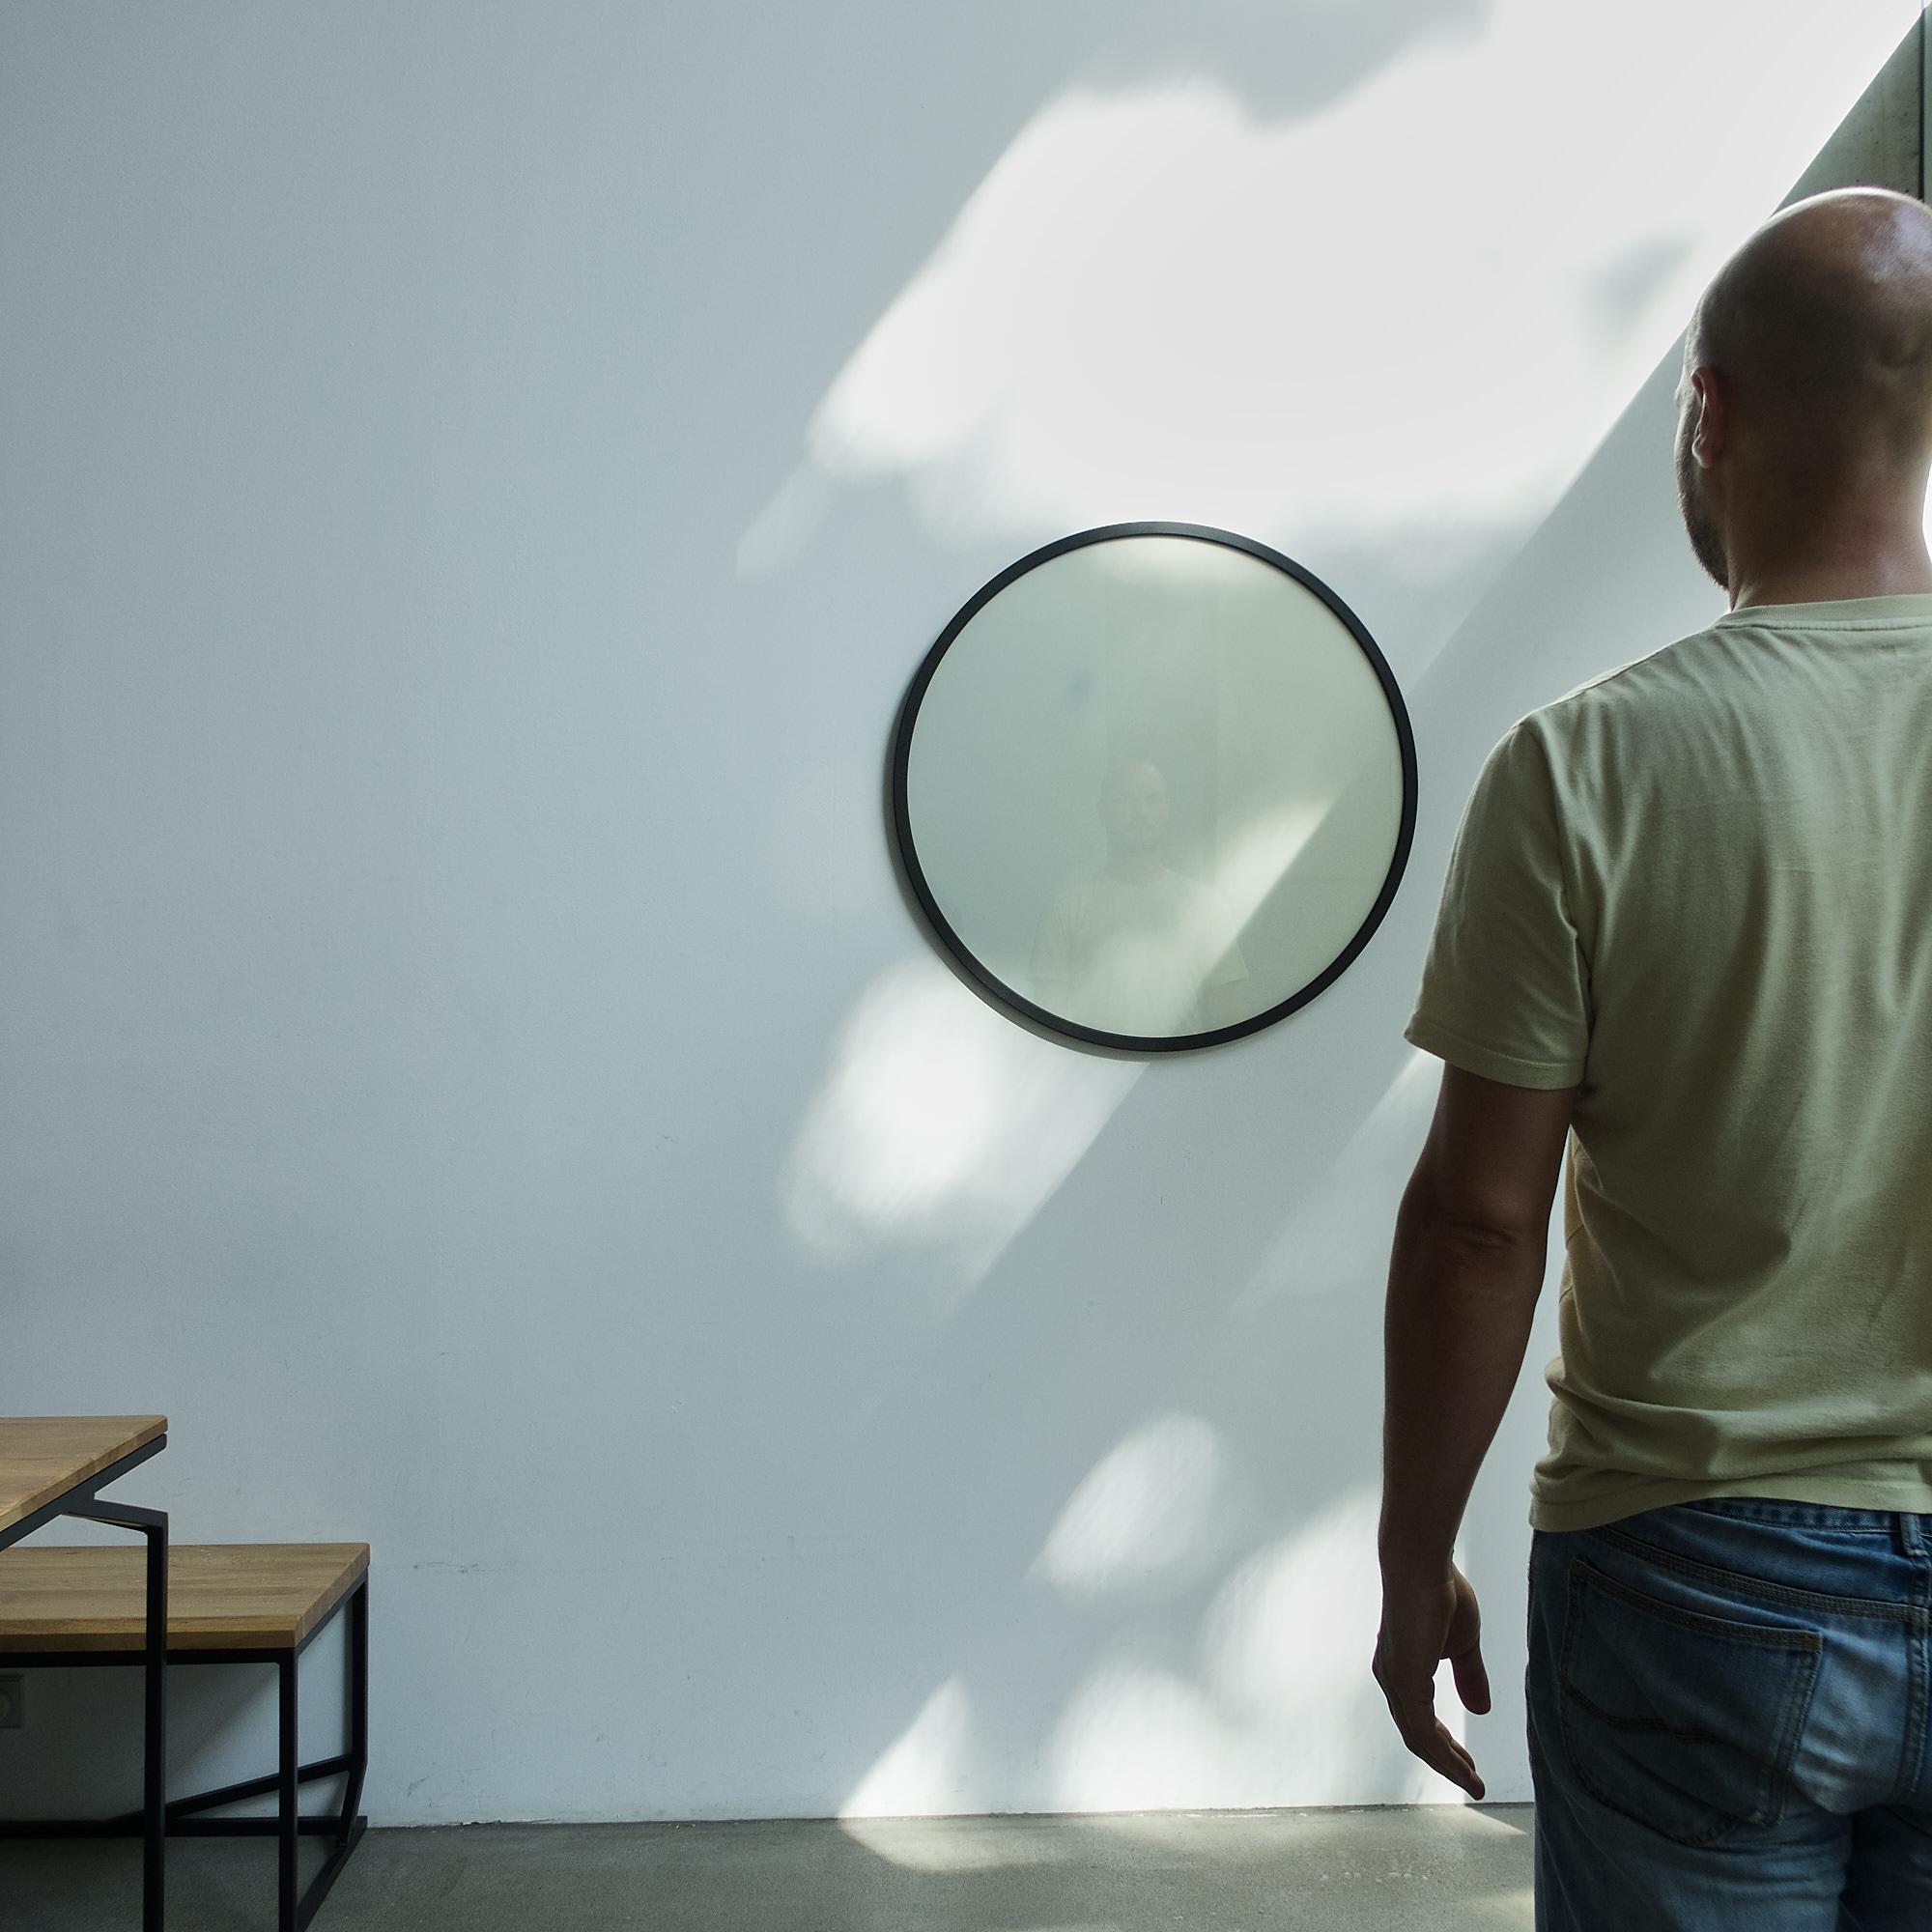 rlon-pranayama-kinetic-art-installation-1563.jpg